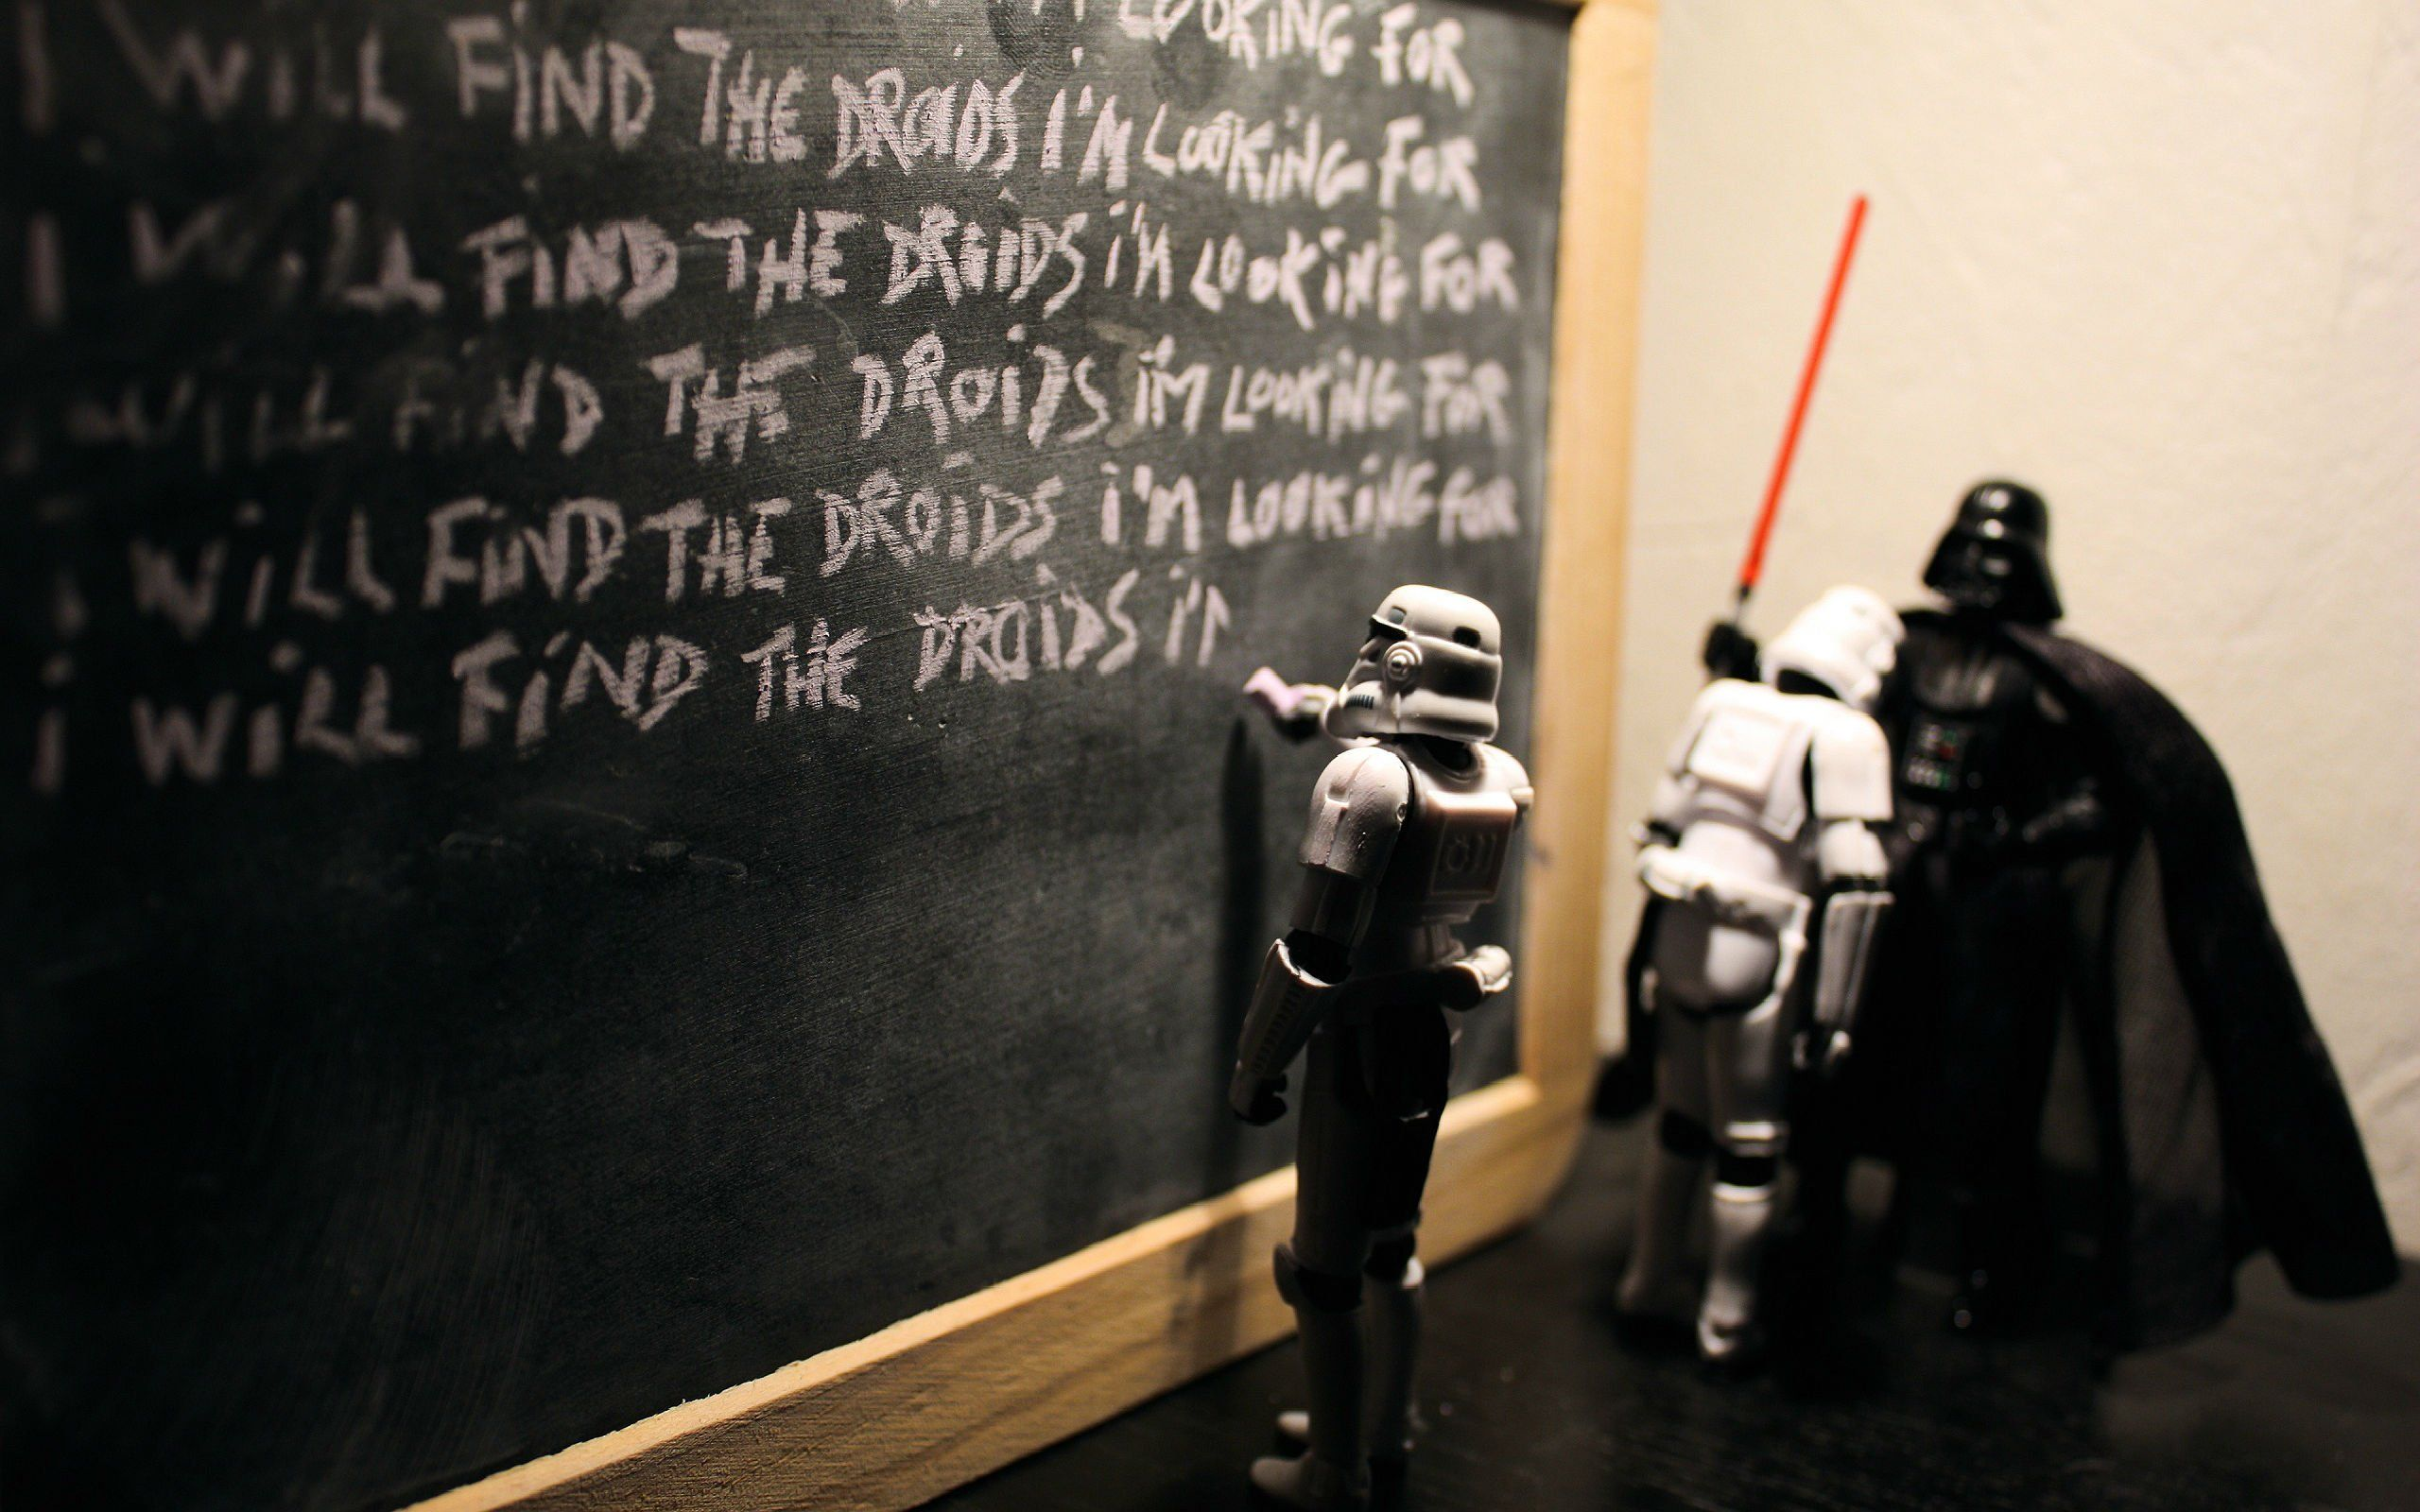 Funny Lego Star Wars Wallpapers On Wallpaperdog